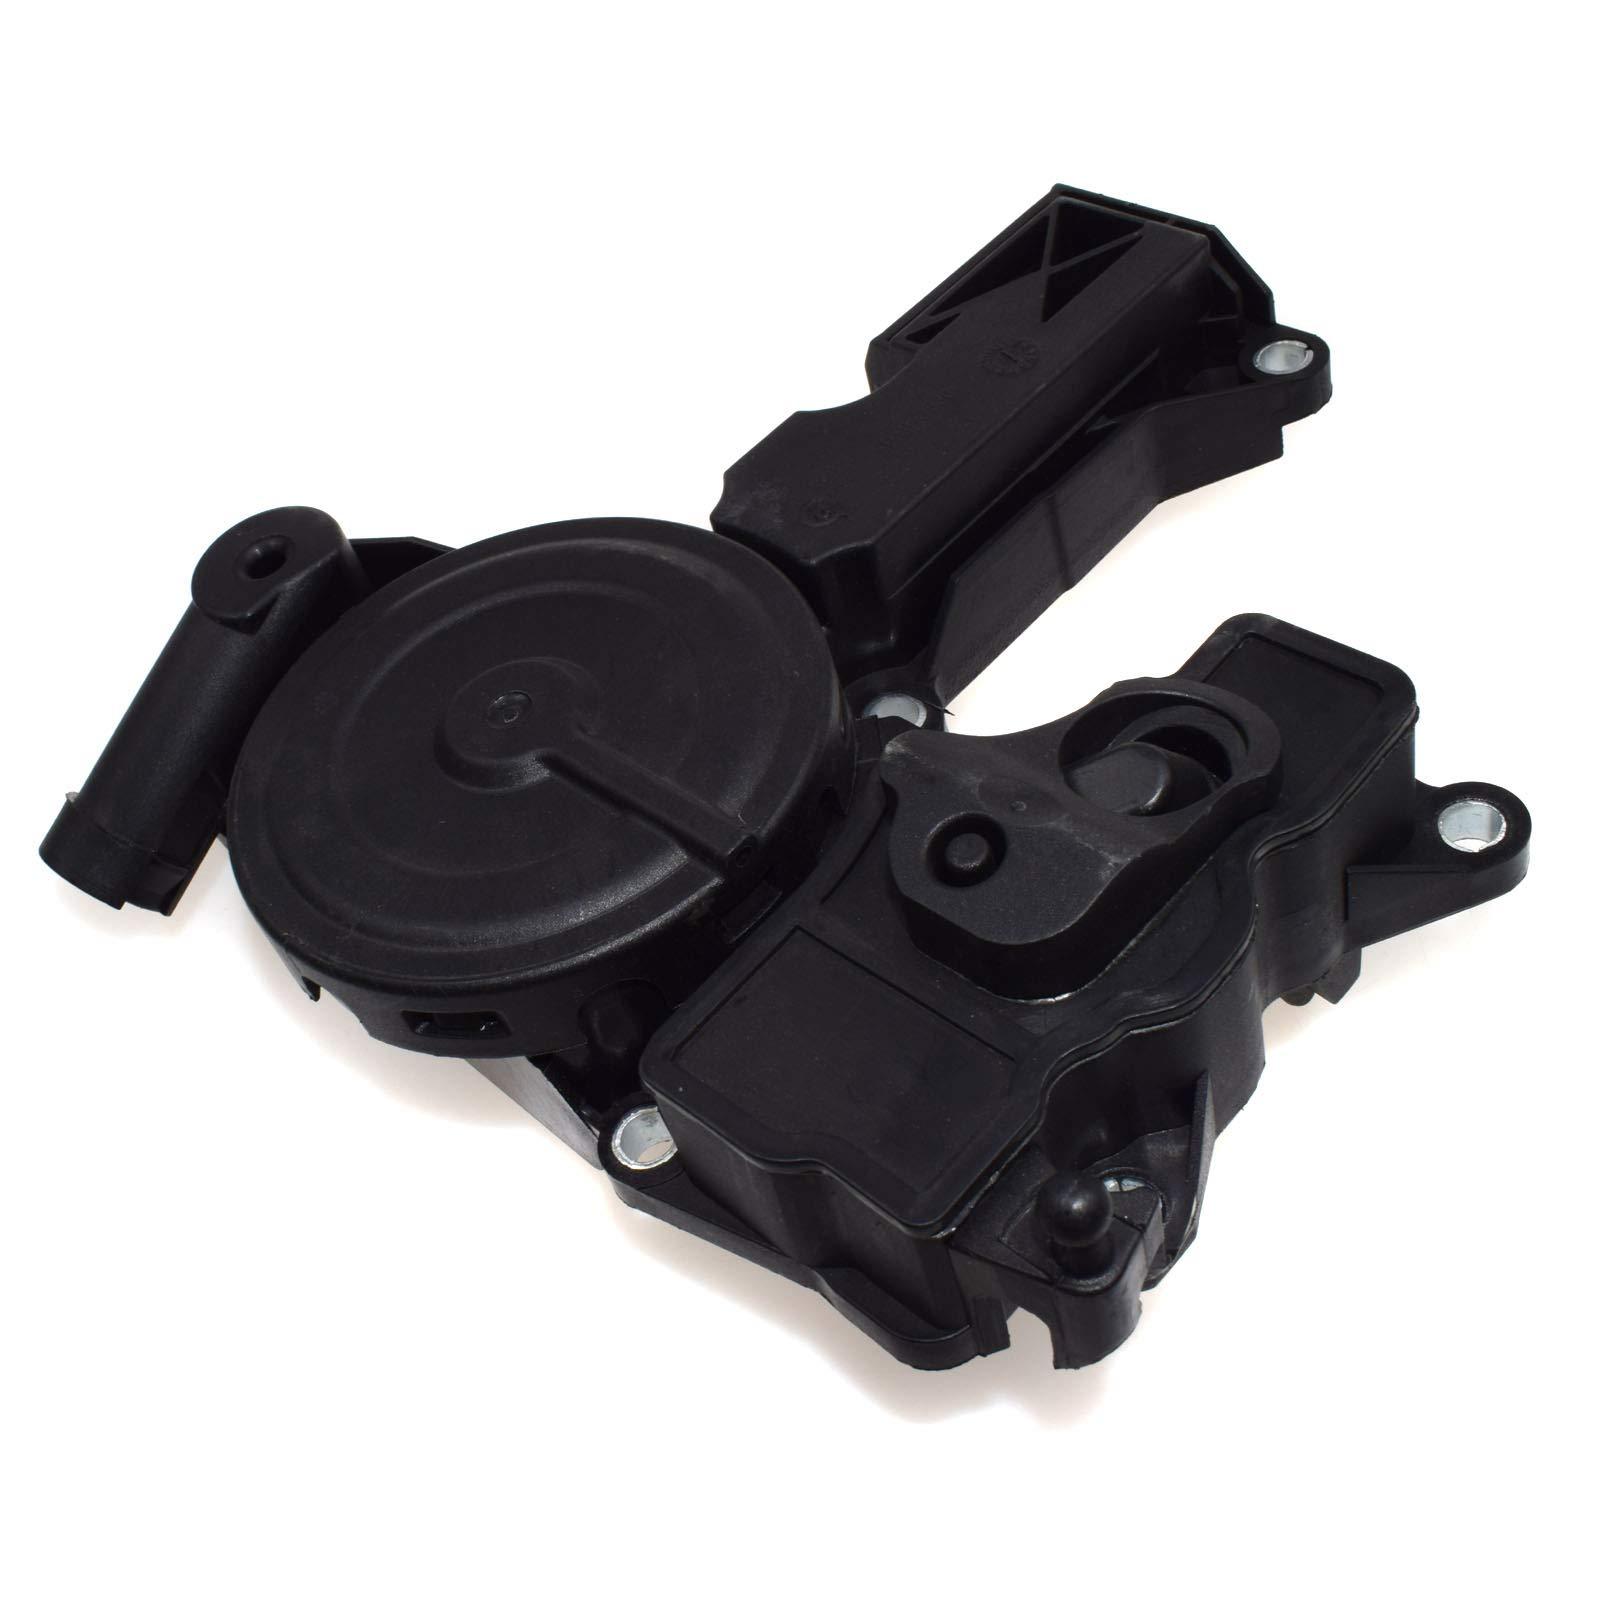 NEW Oil Separator PCV Valve 06H103495B Fit AUDI A4 A3 TT VW Jetta Golf Passat A4 Quattro 2011-2014